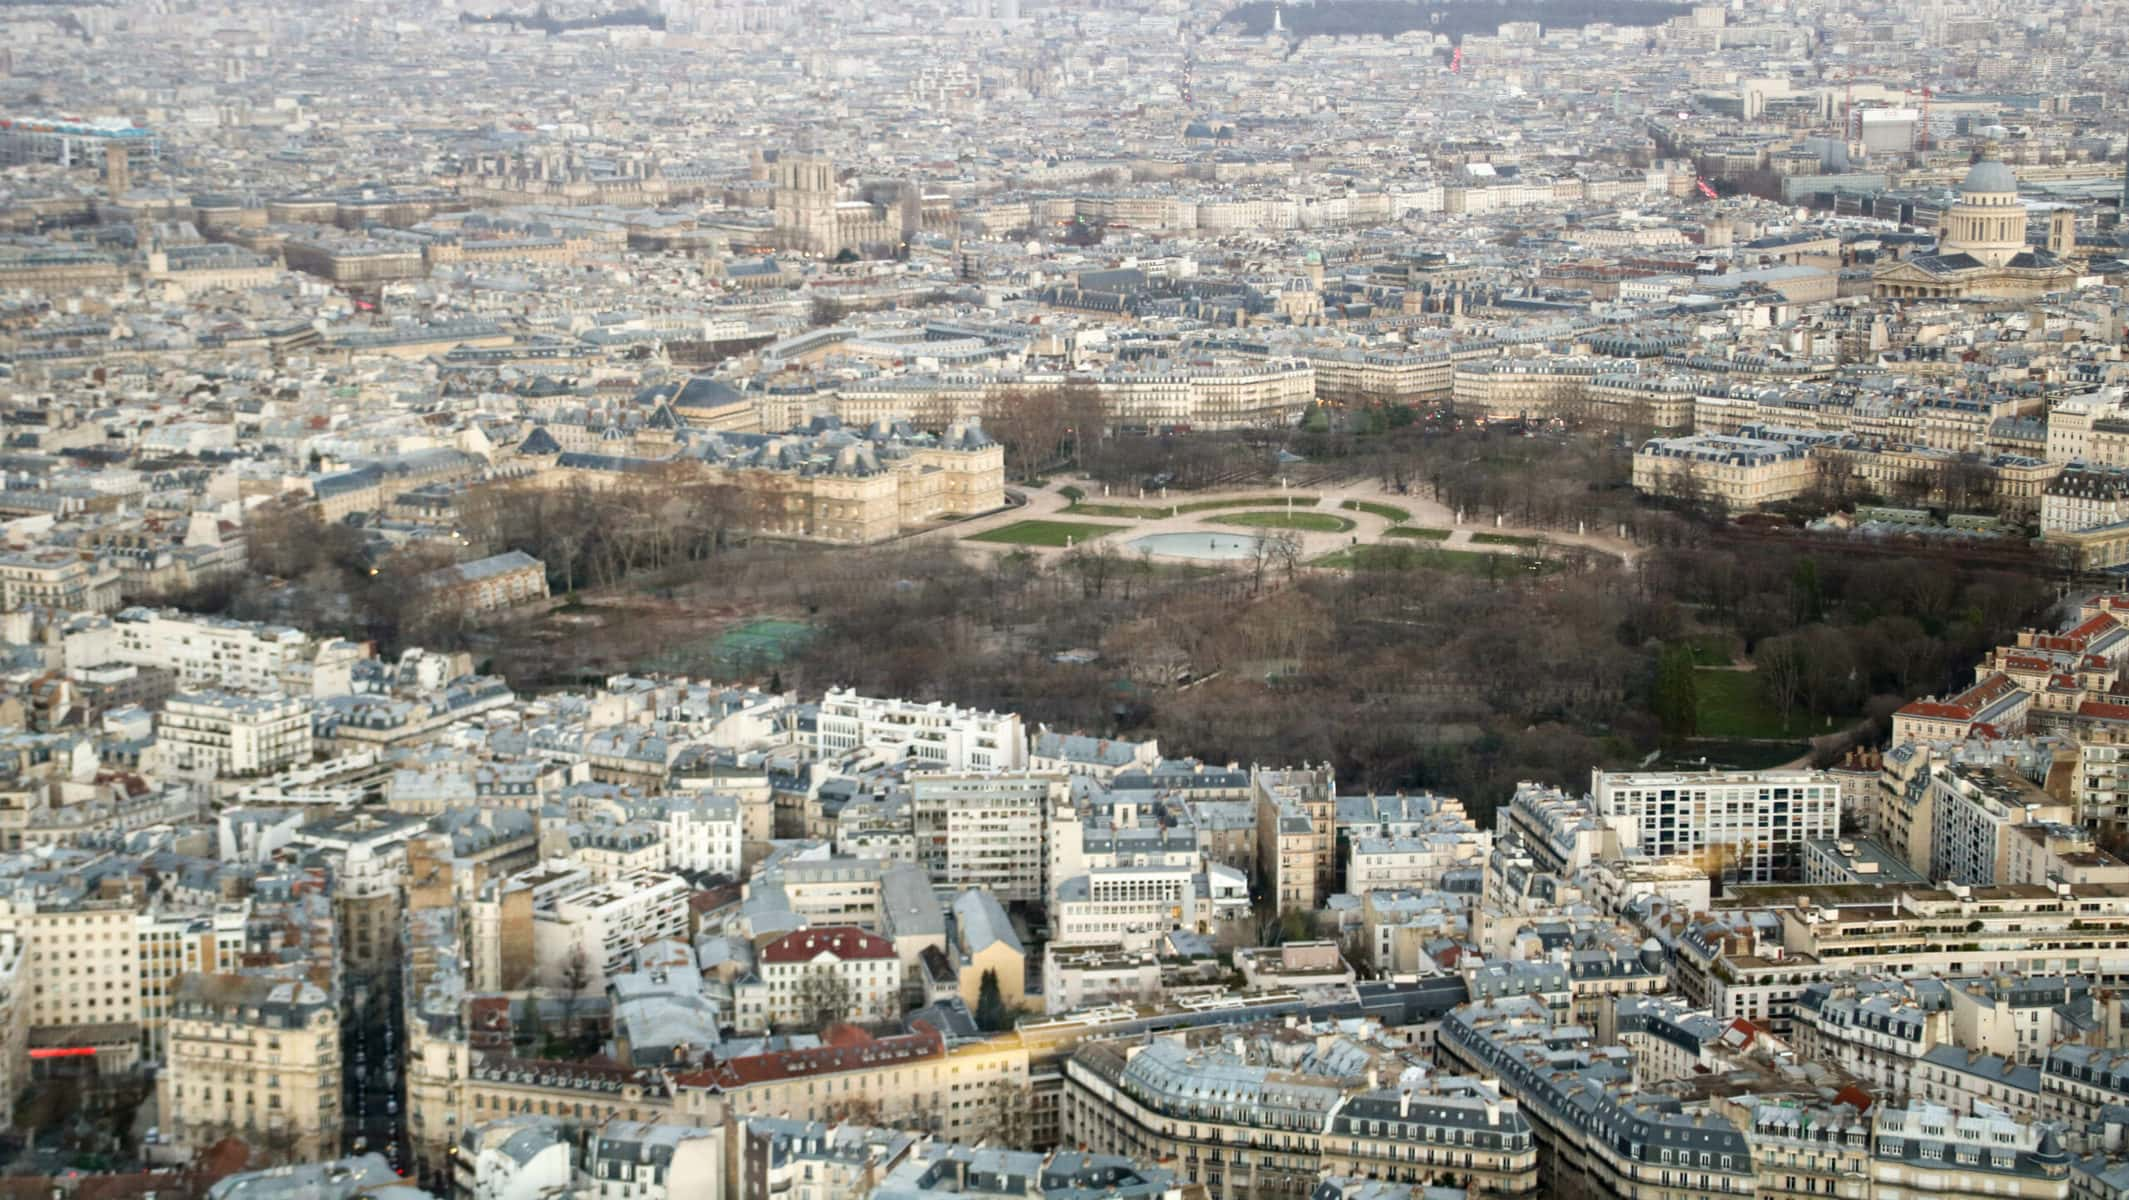 Tour Montparnasse, Paris: Blick auf den Palais de Luxemburg, Notre-Dame und das Pantheon